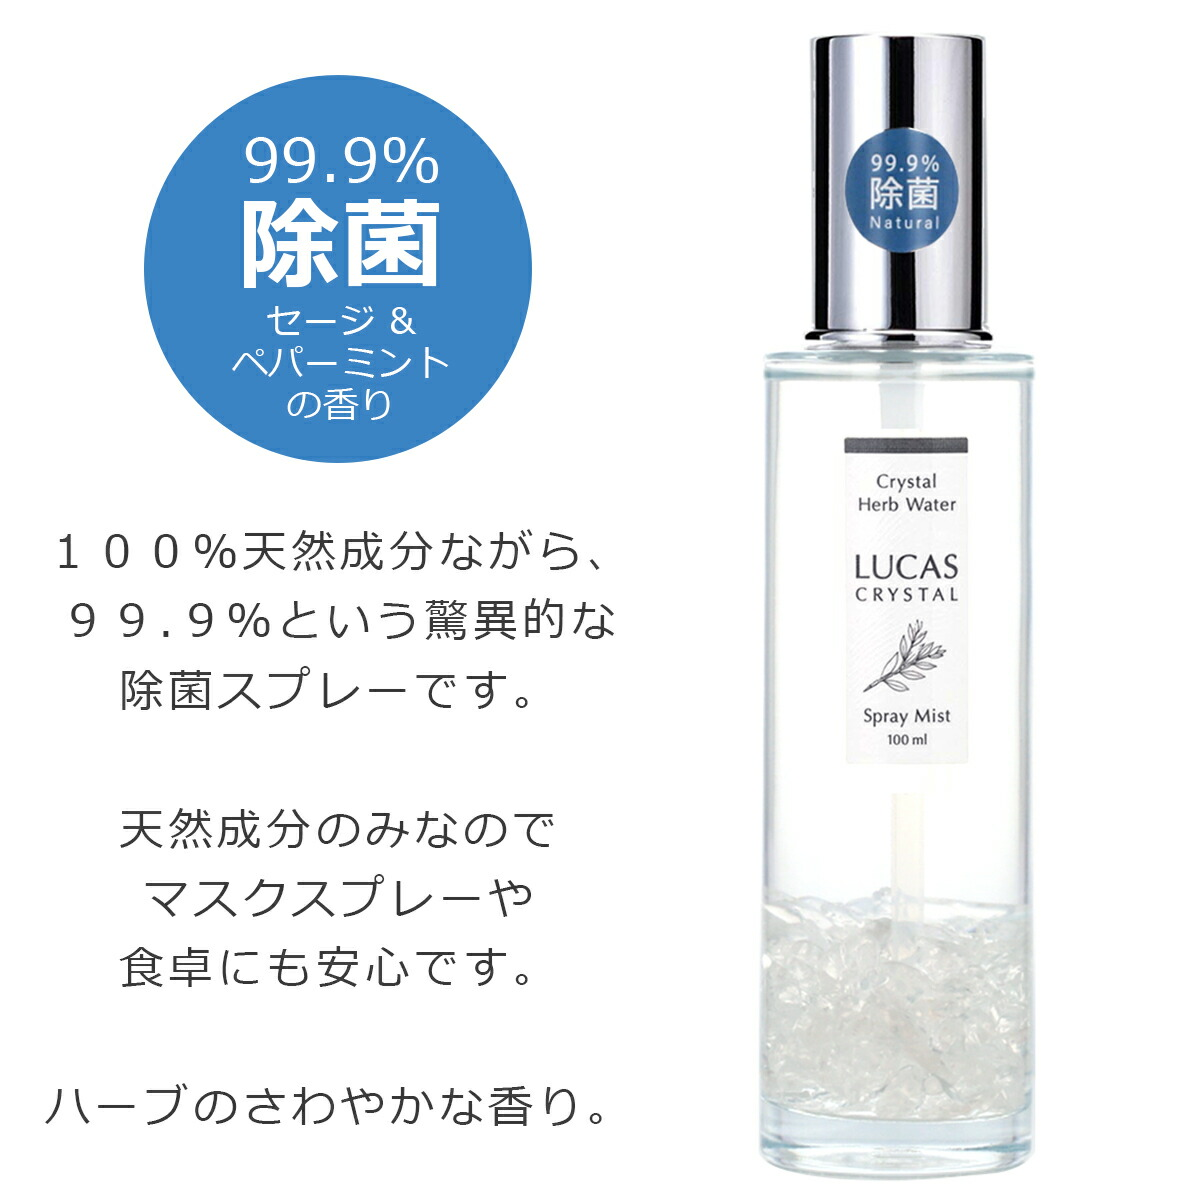 LUCAS ハーブ除菌スプレー(除菌率99.9%)